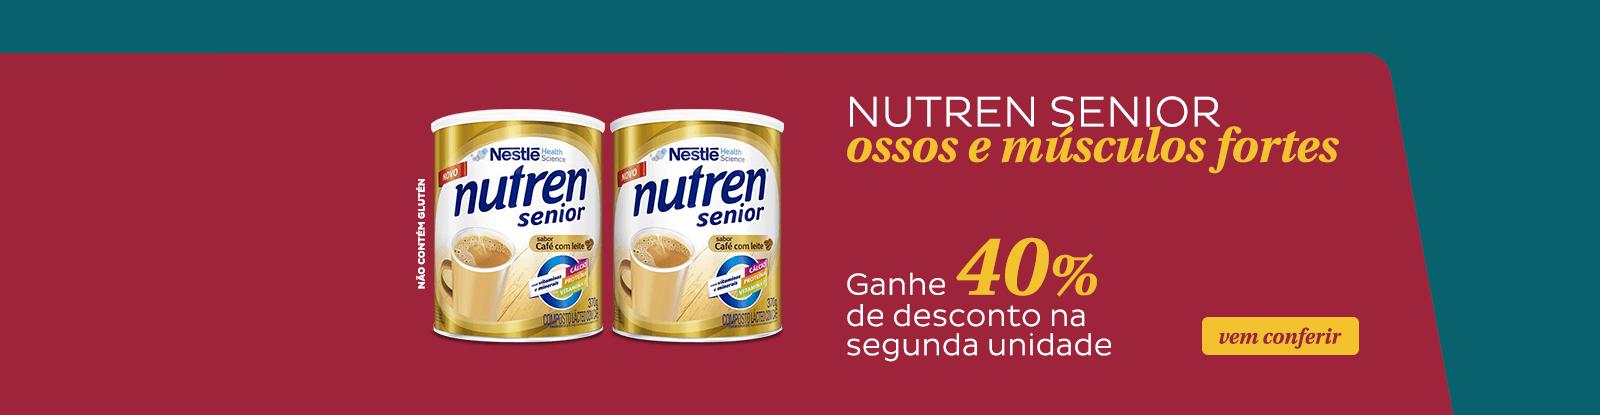 Nutren_Senior_40%off